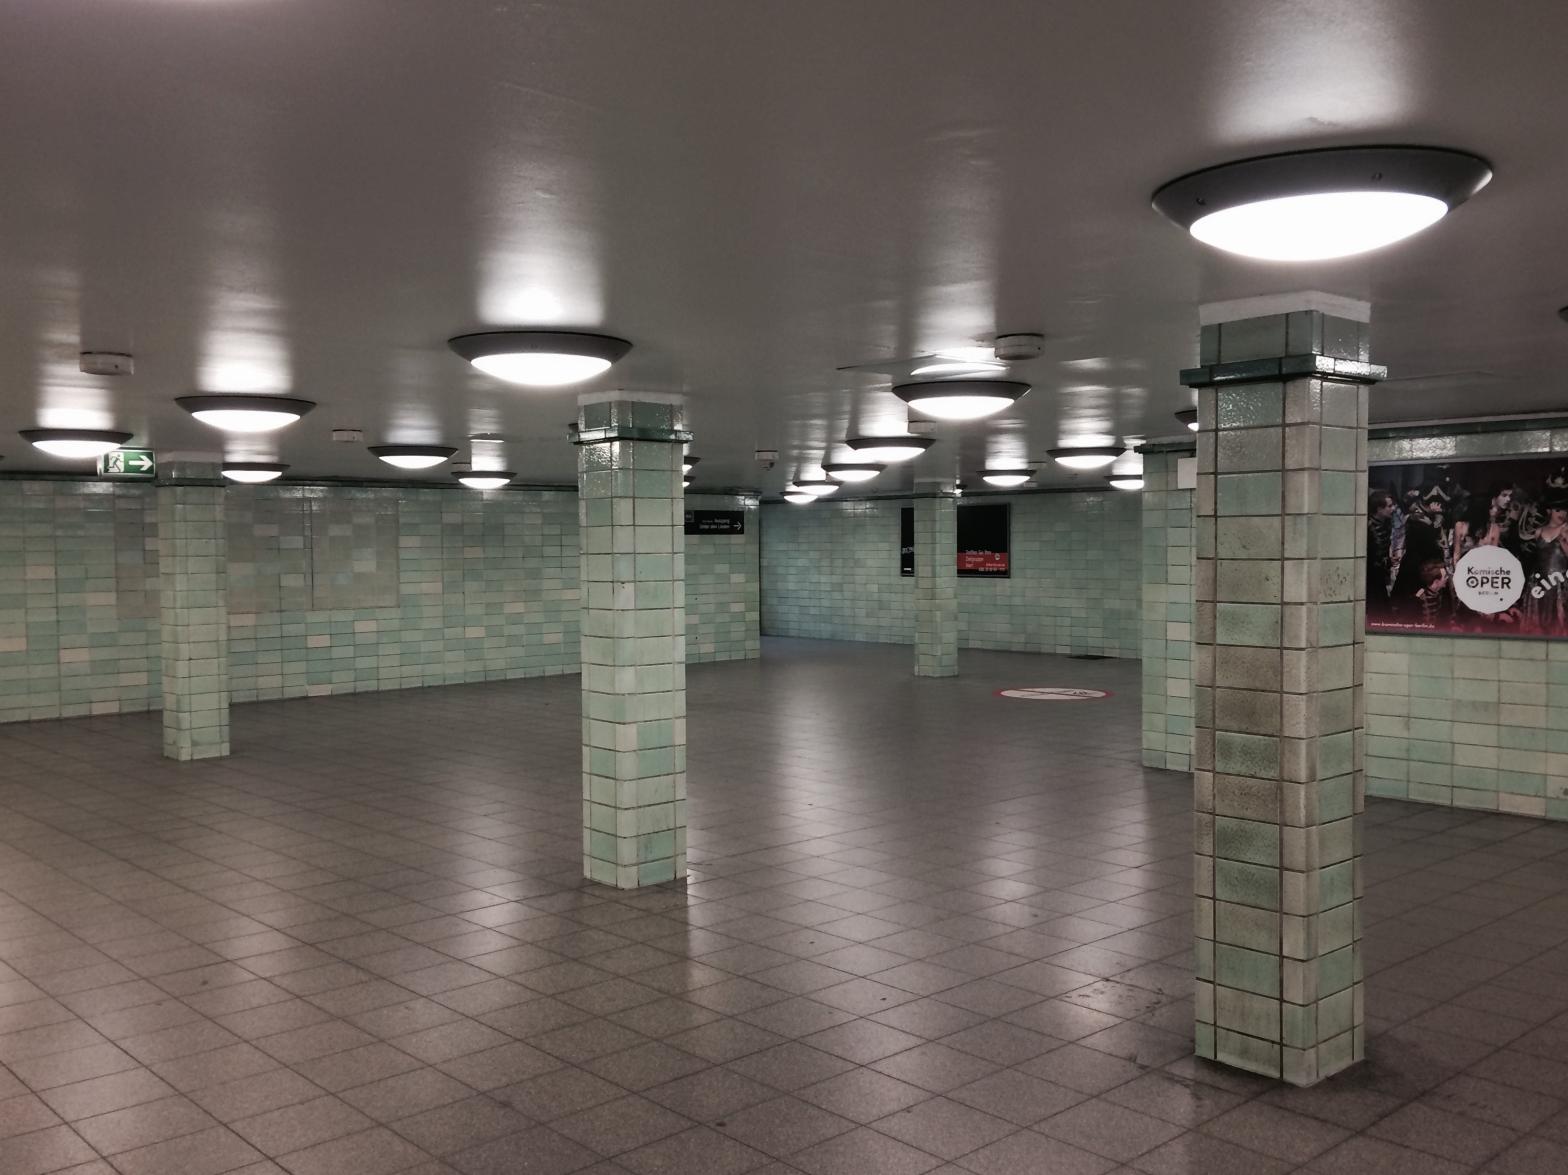 East German train station